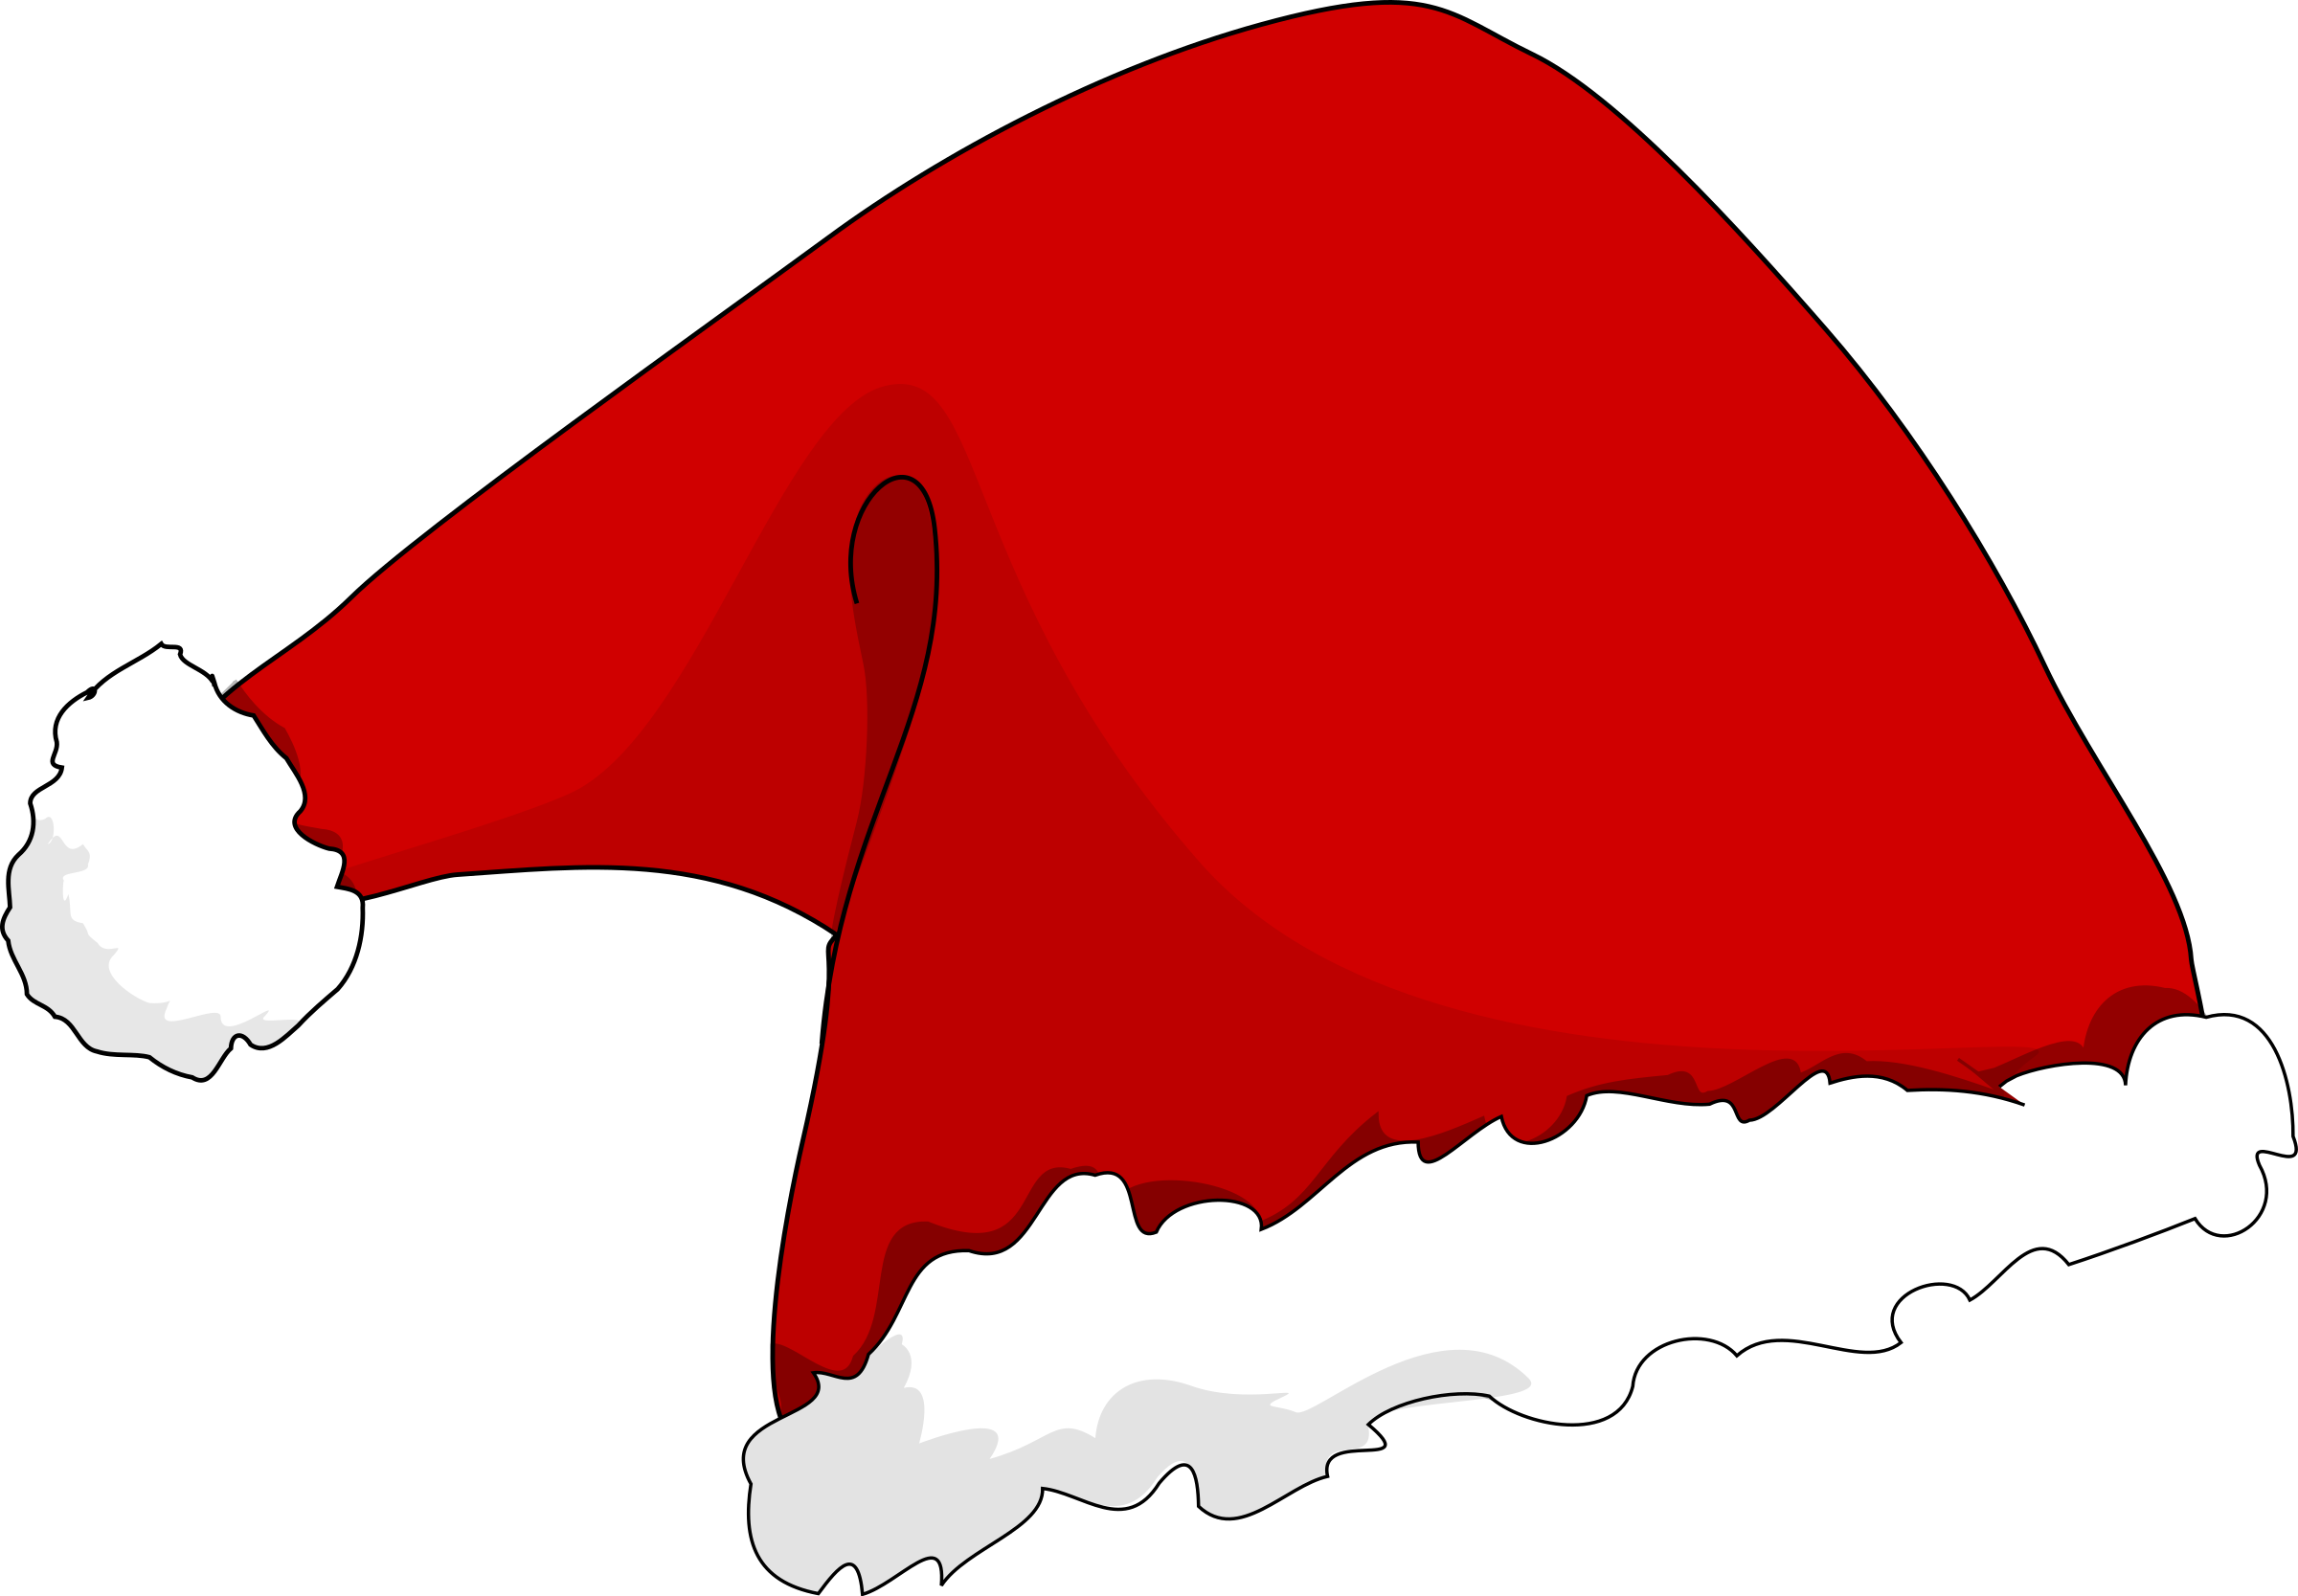 Big image png. Gingerbread clipart santa hat